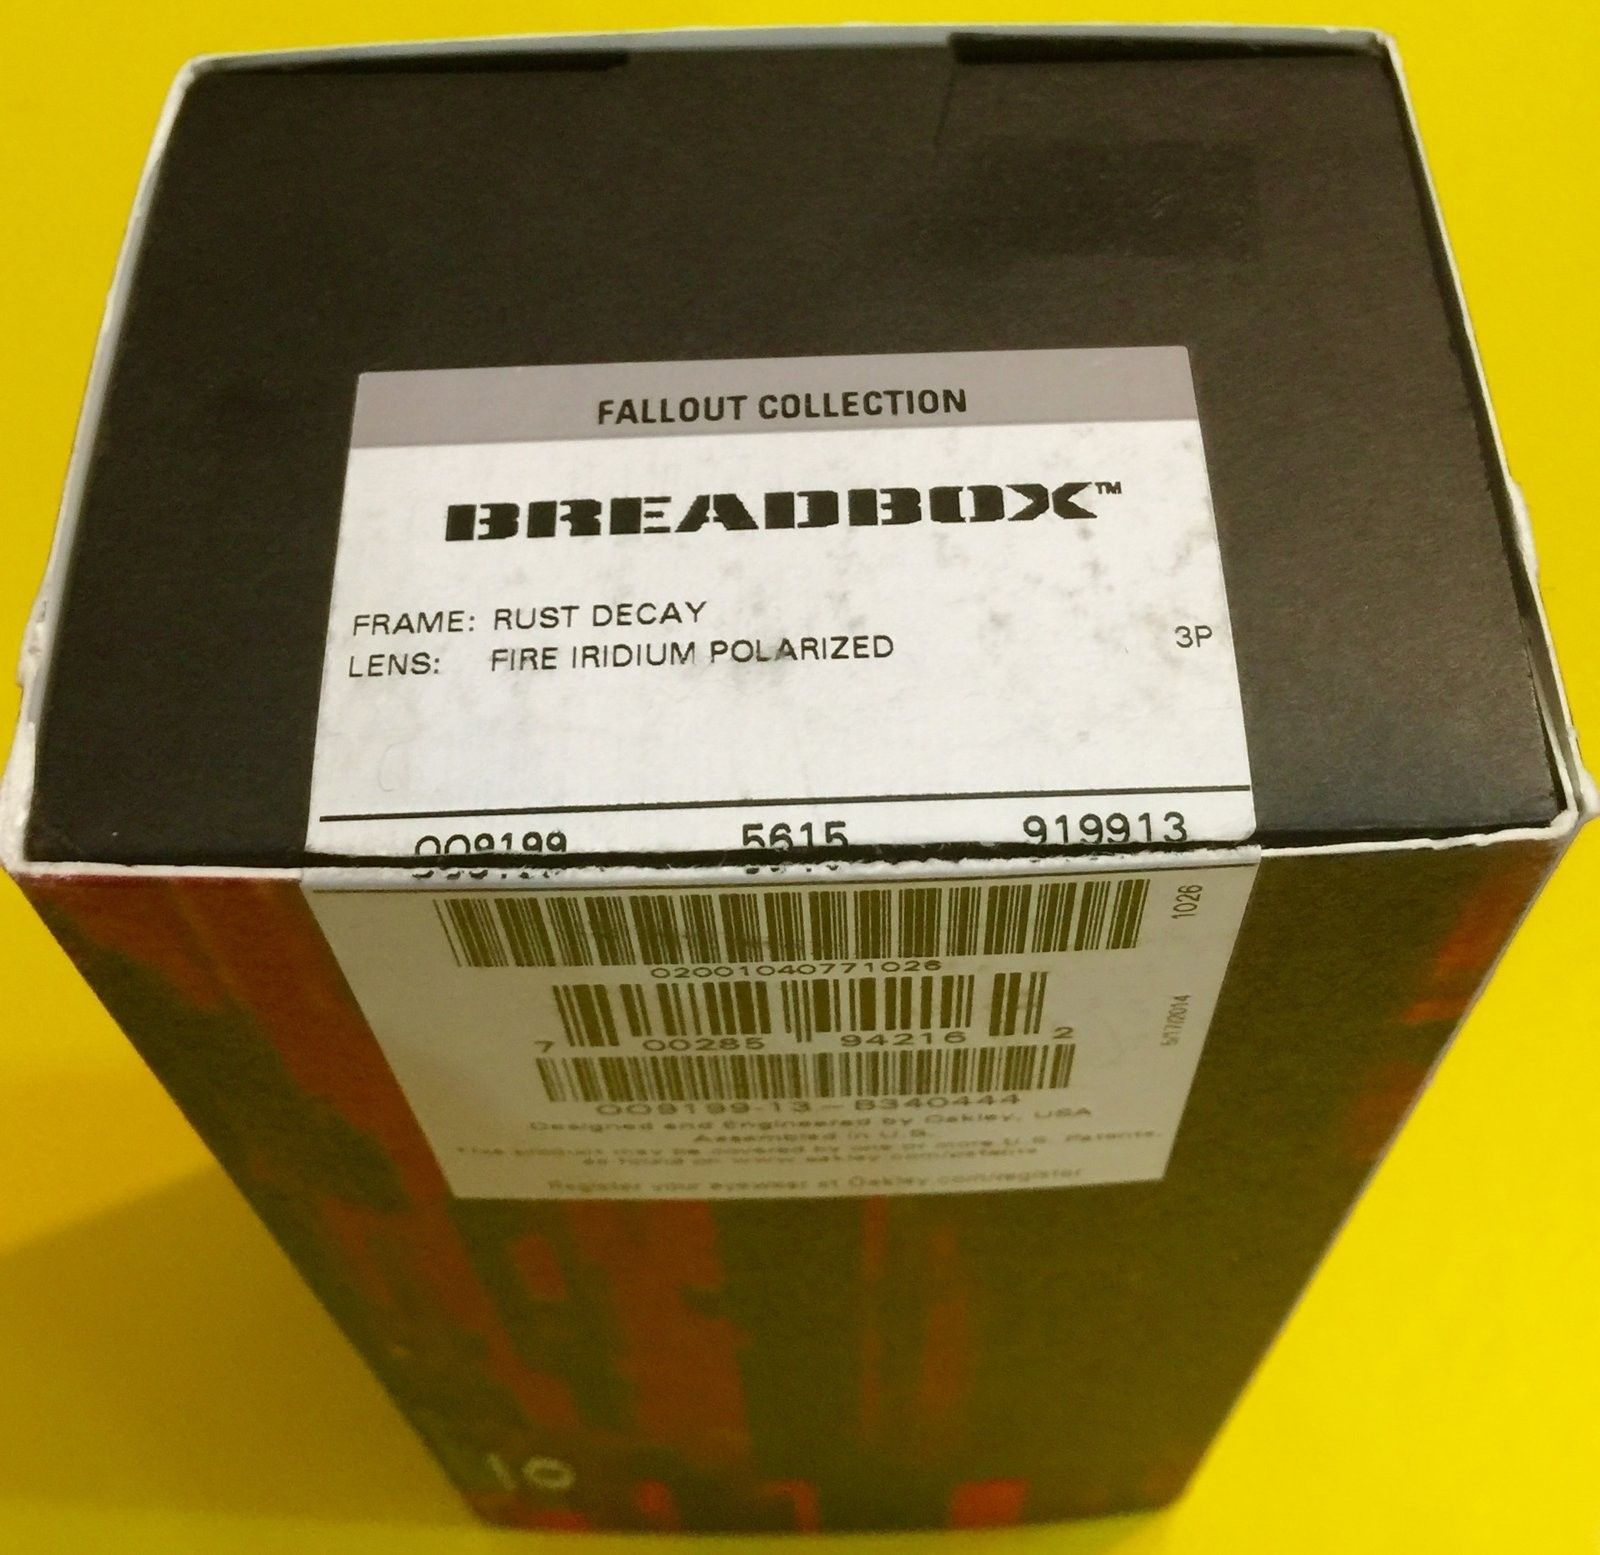 BNIB Breadbox Rust Decay / Fire Iridium Polarized - image.jpeg